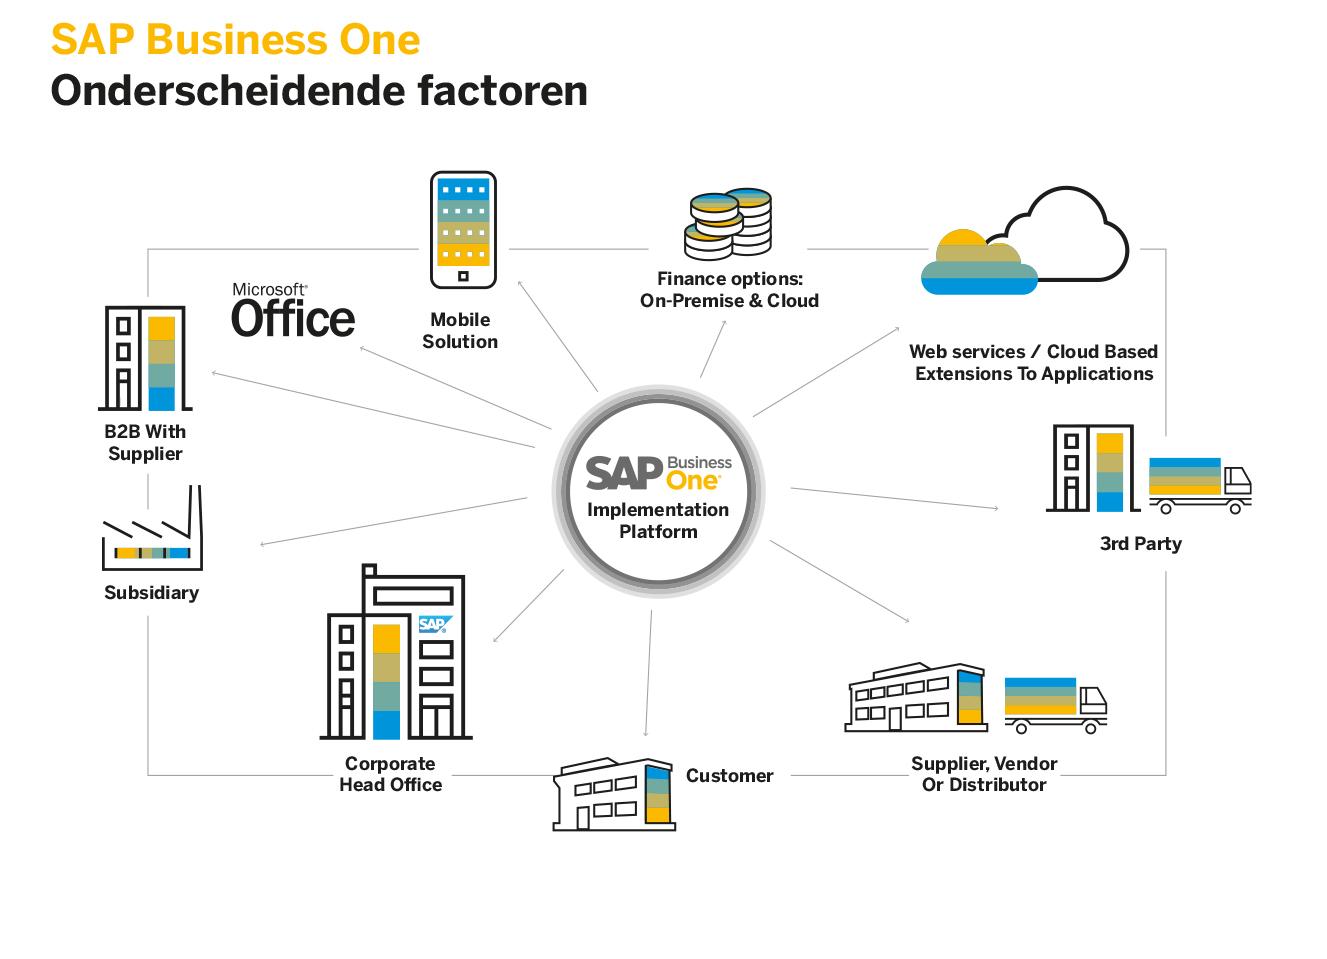 SAP Business One software onderscheidende factoren